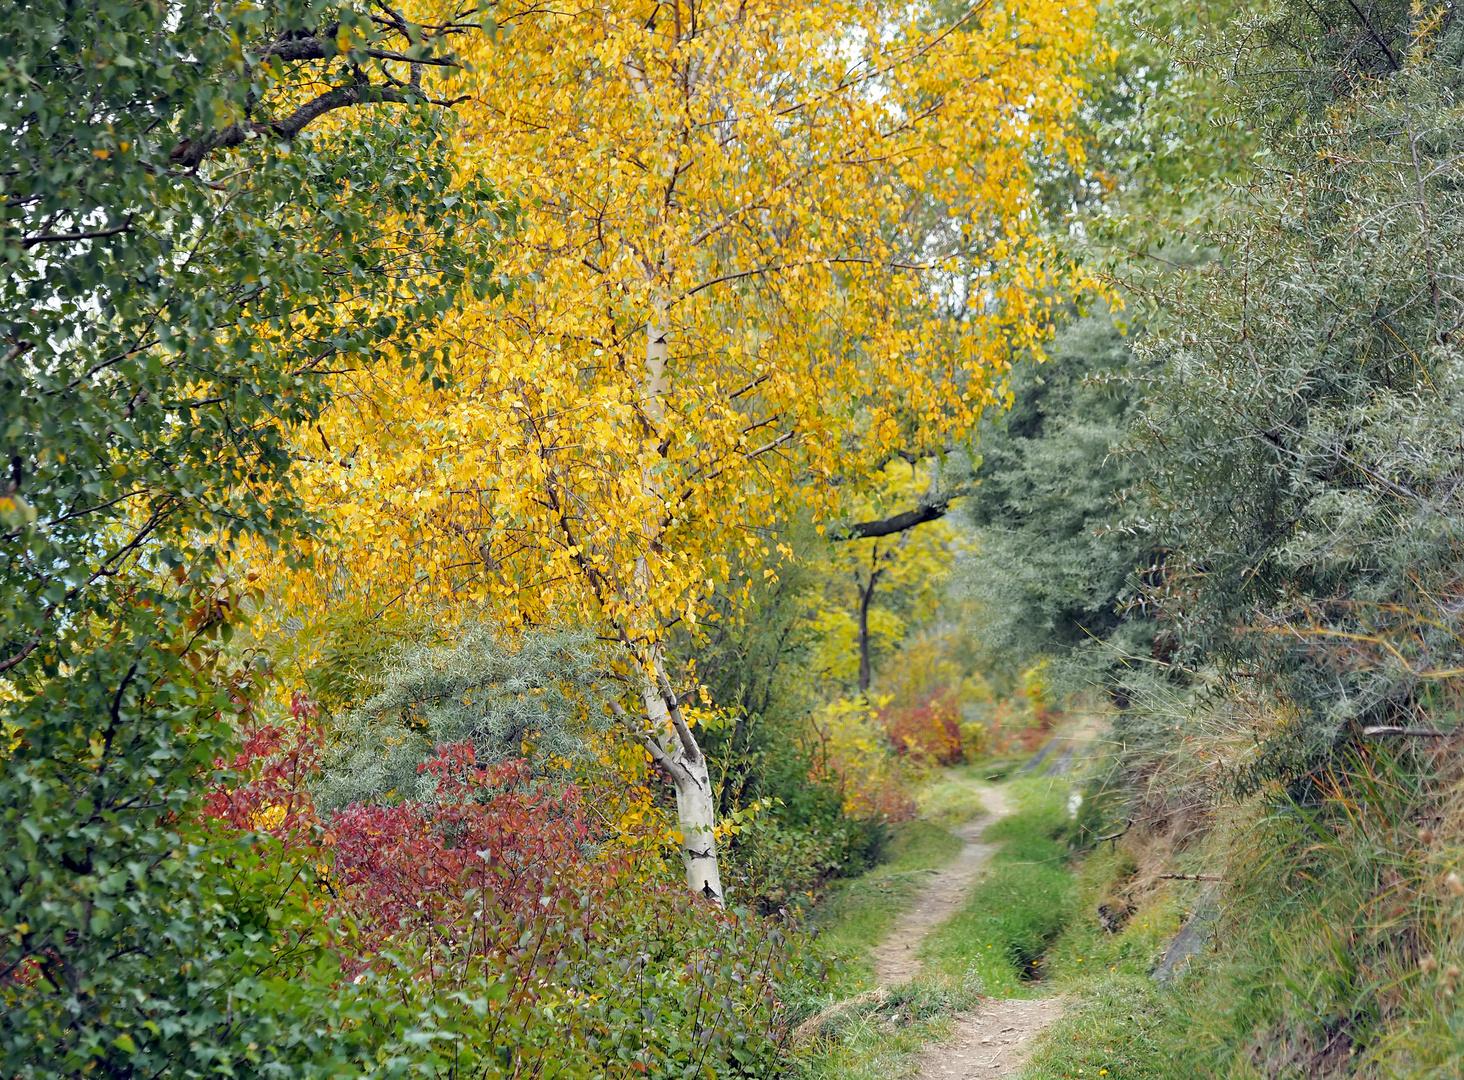 Zauberhafte Herbststimmung! - La poésie de l'automne!